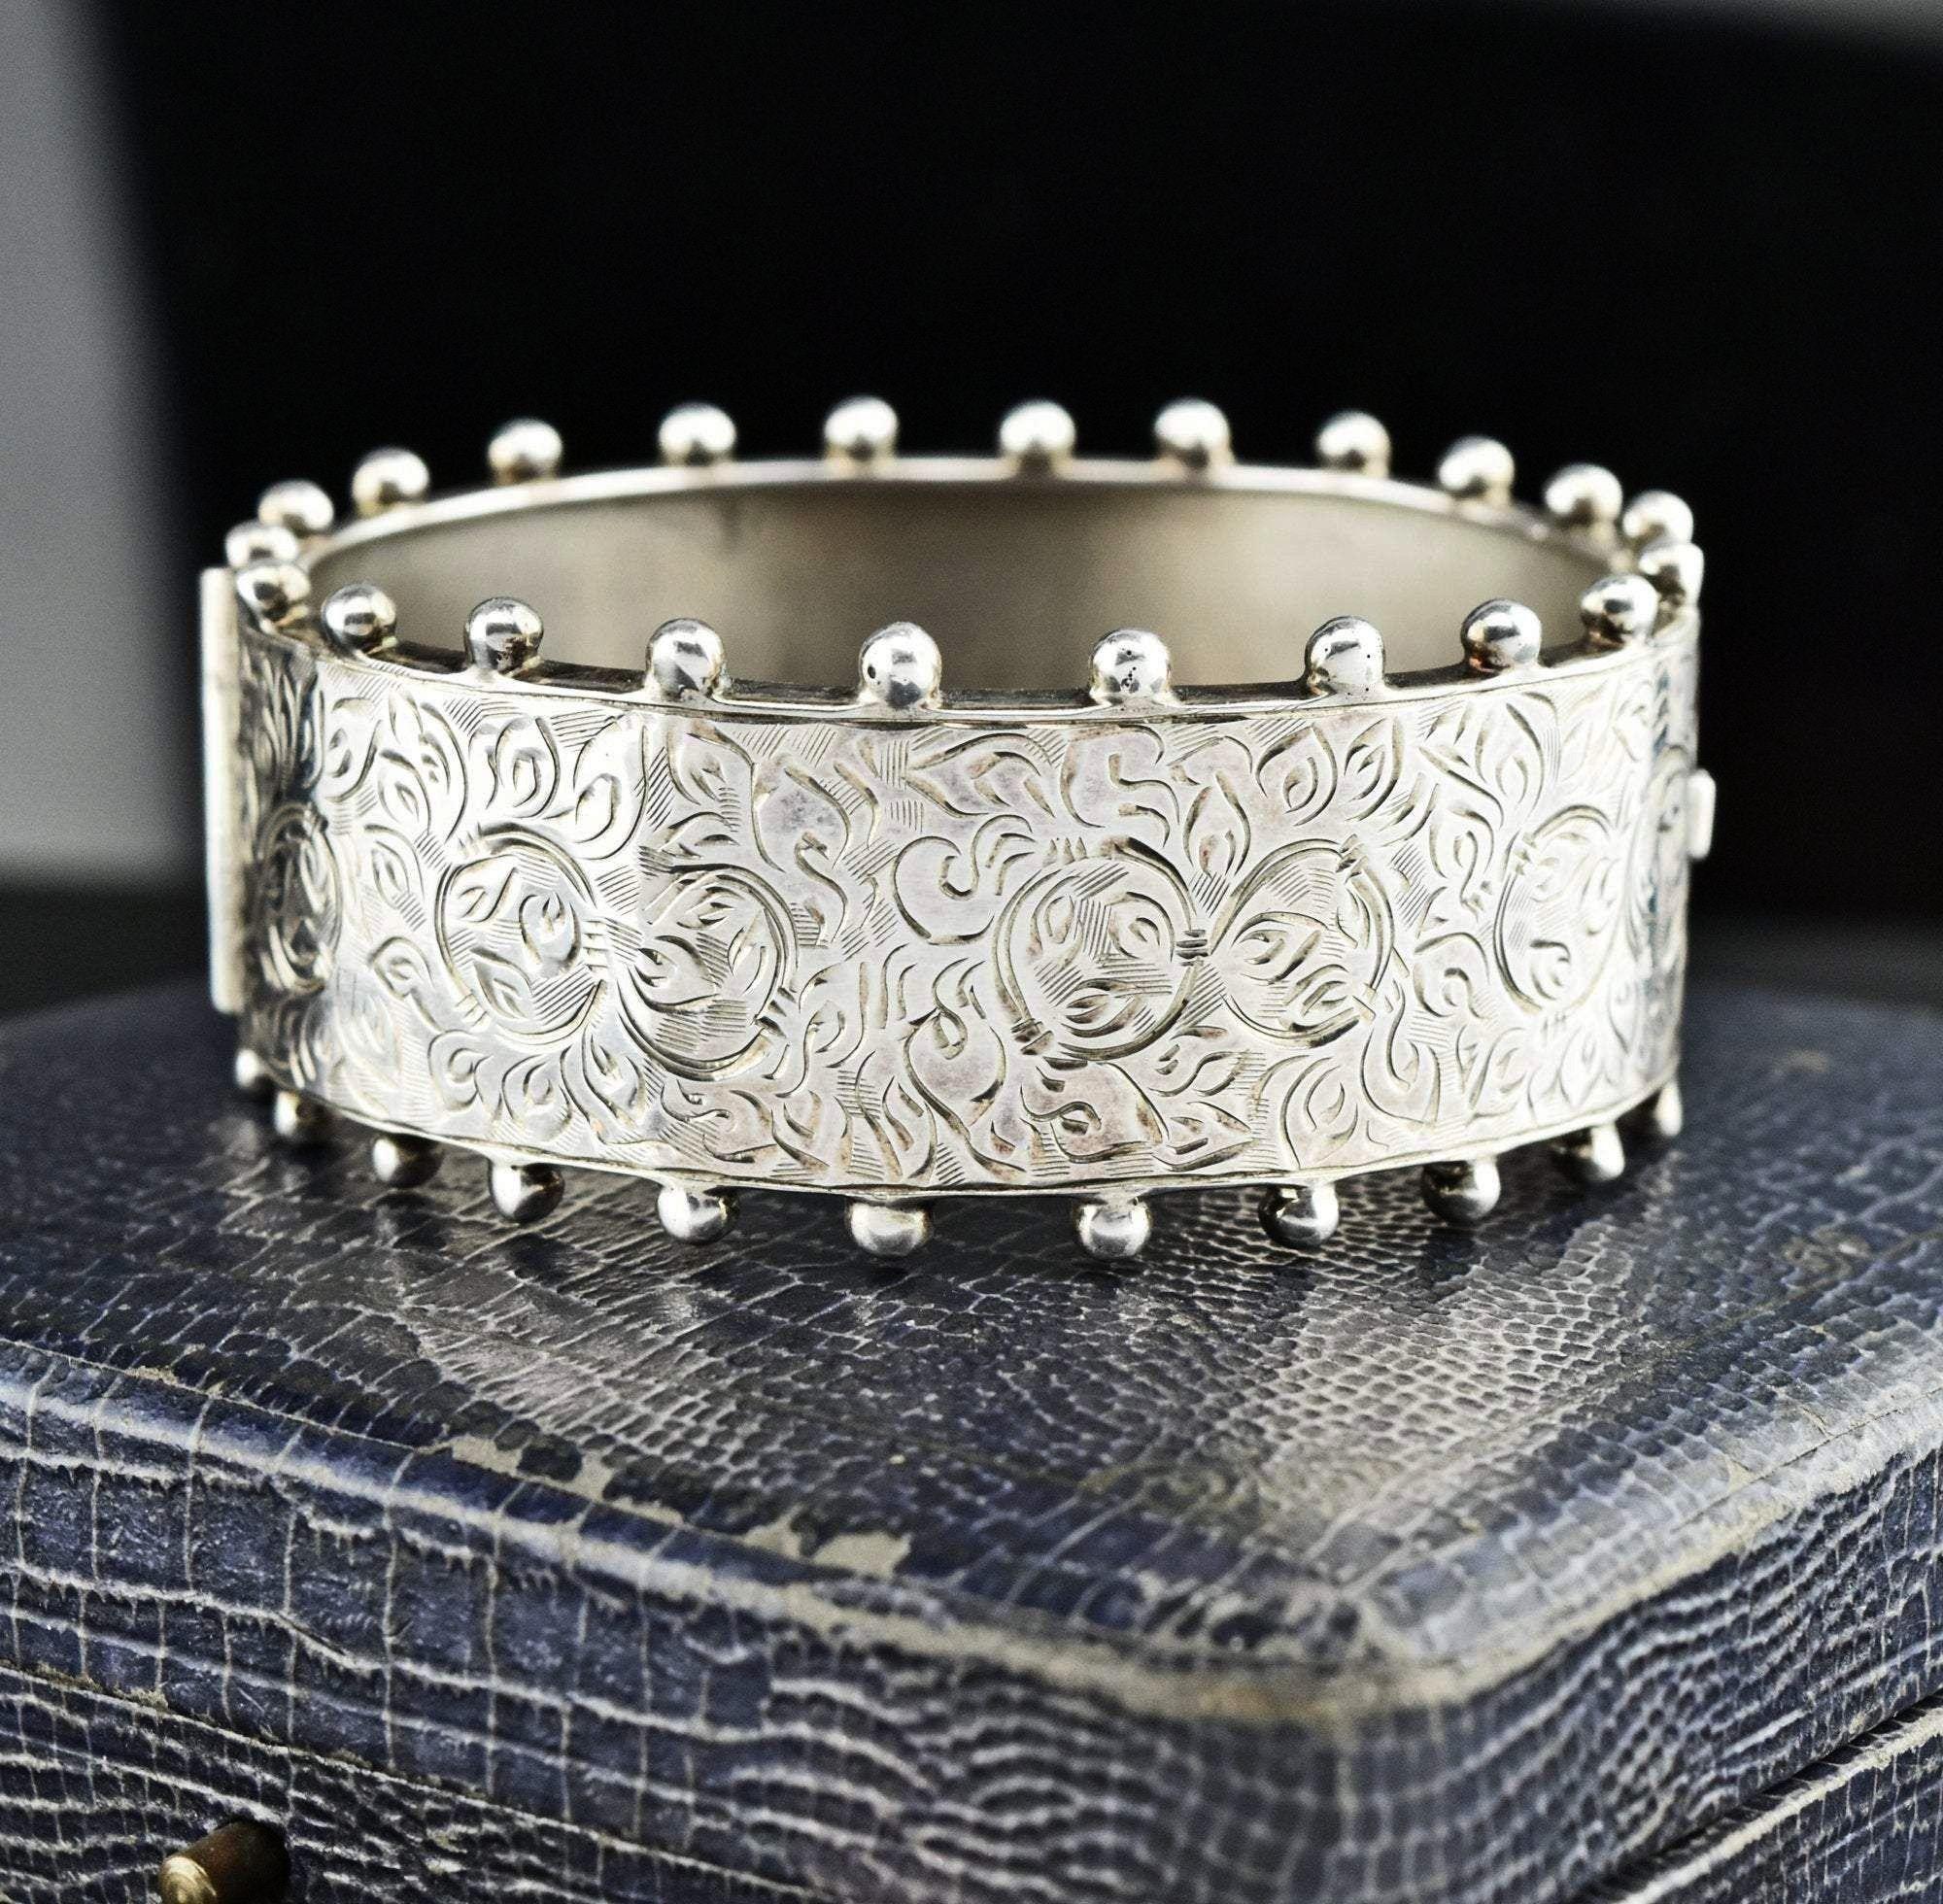 Sterling Silver Engraved Wide Cuff Bracelet Victorian Sterling Silver Engraved Wide Cuff Bracelet VIntage Albert Watch Chain Bracelet 1900s  Boylerpf Vintage Victorian El...